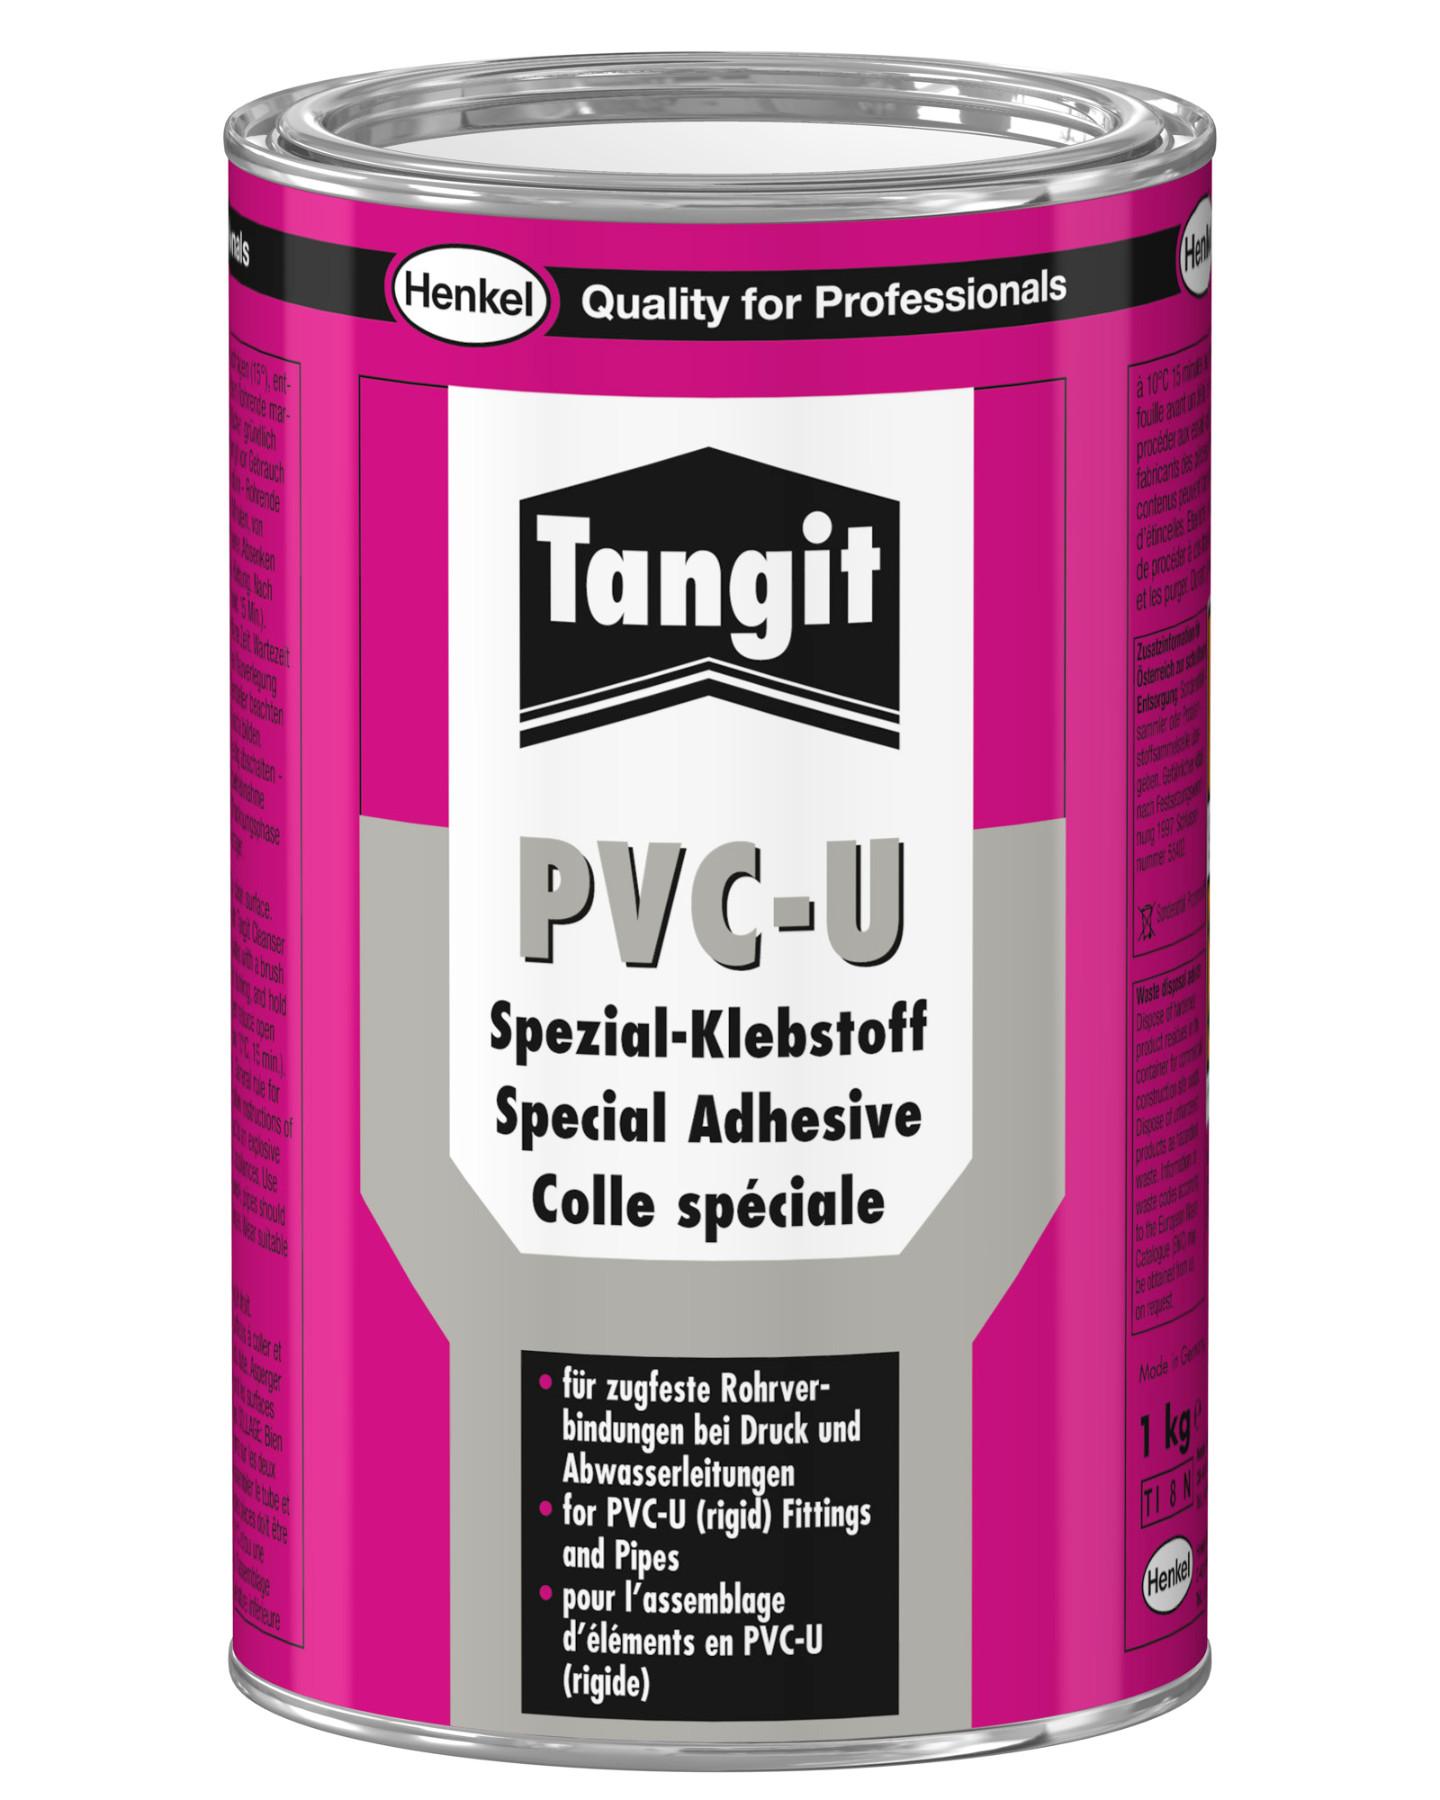 Tangit PVC-U Klebstoff 1kg Dose